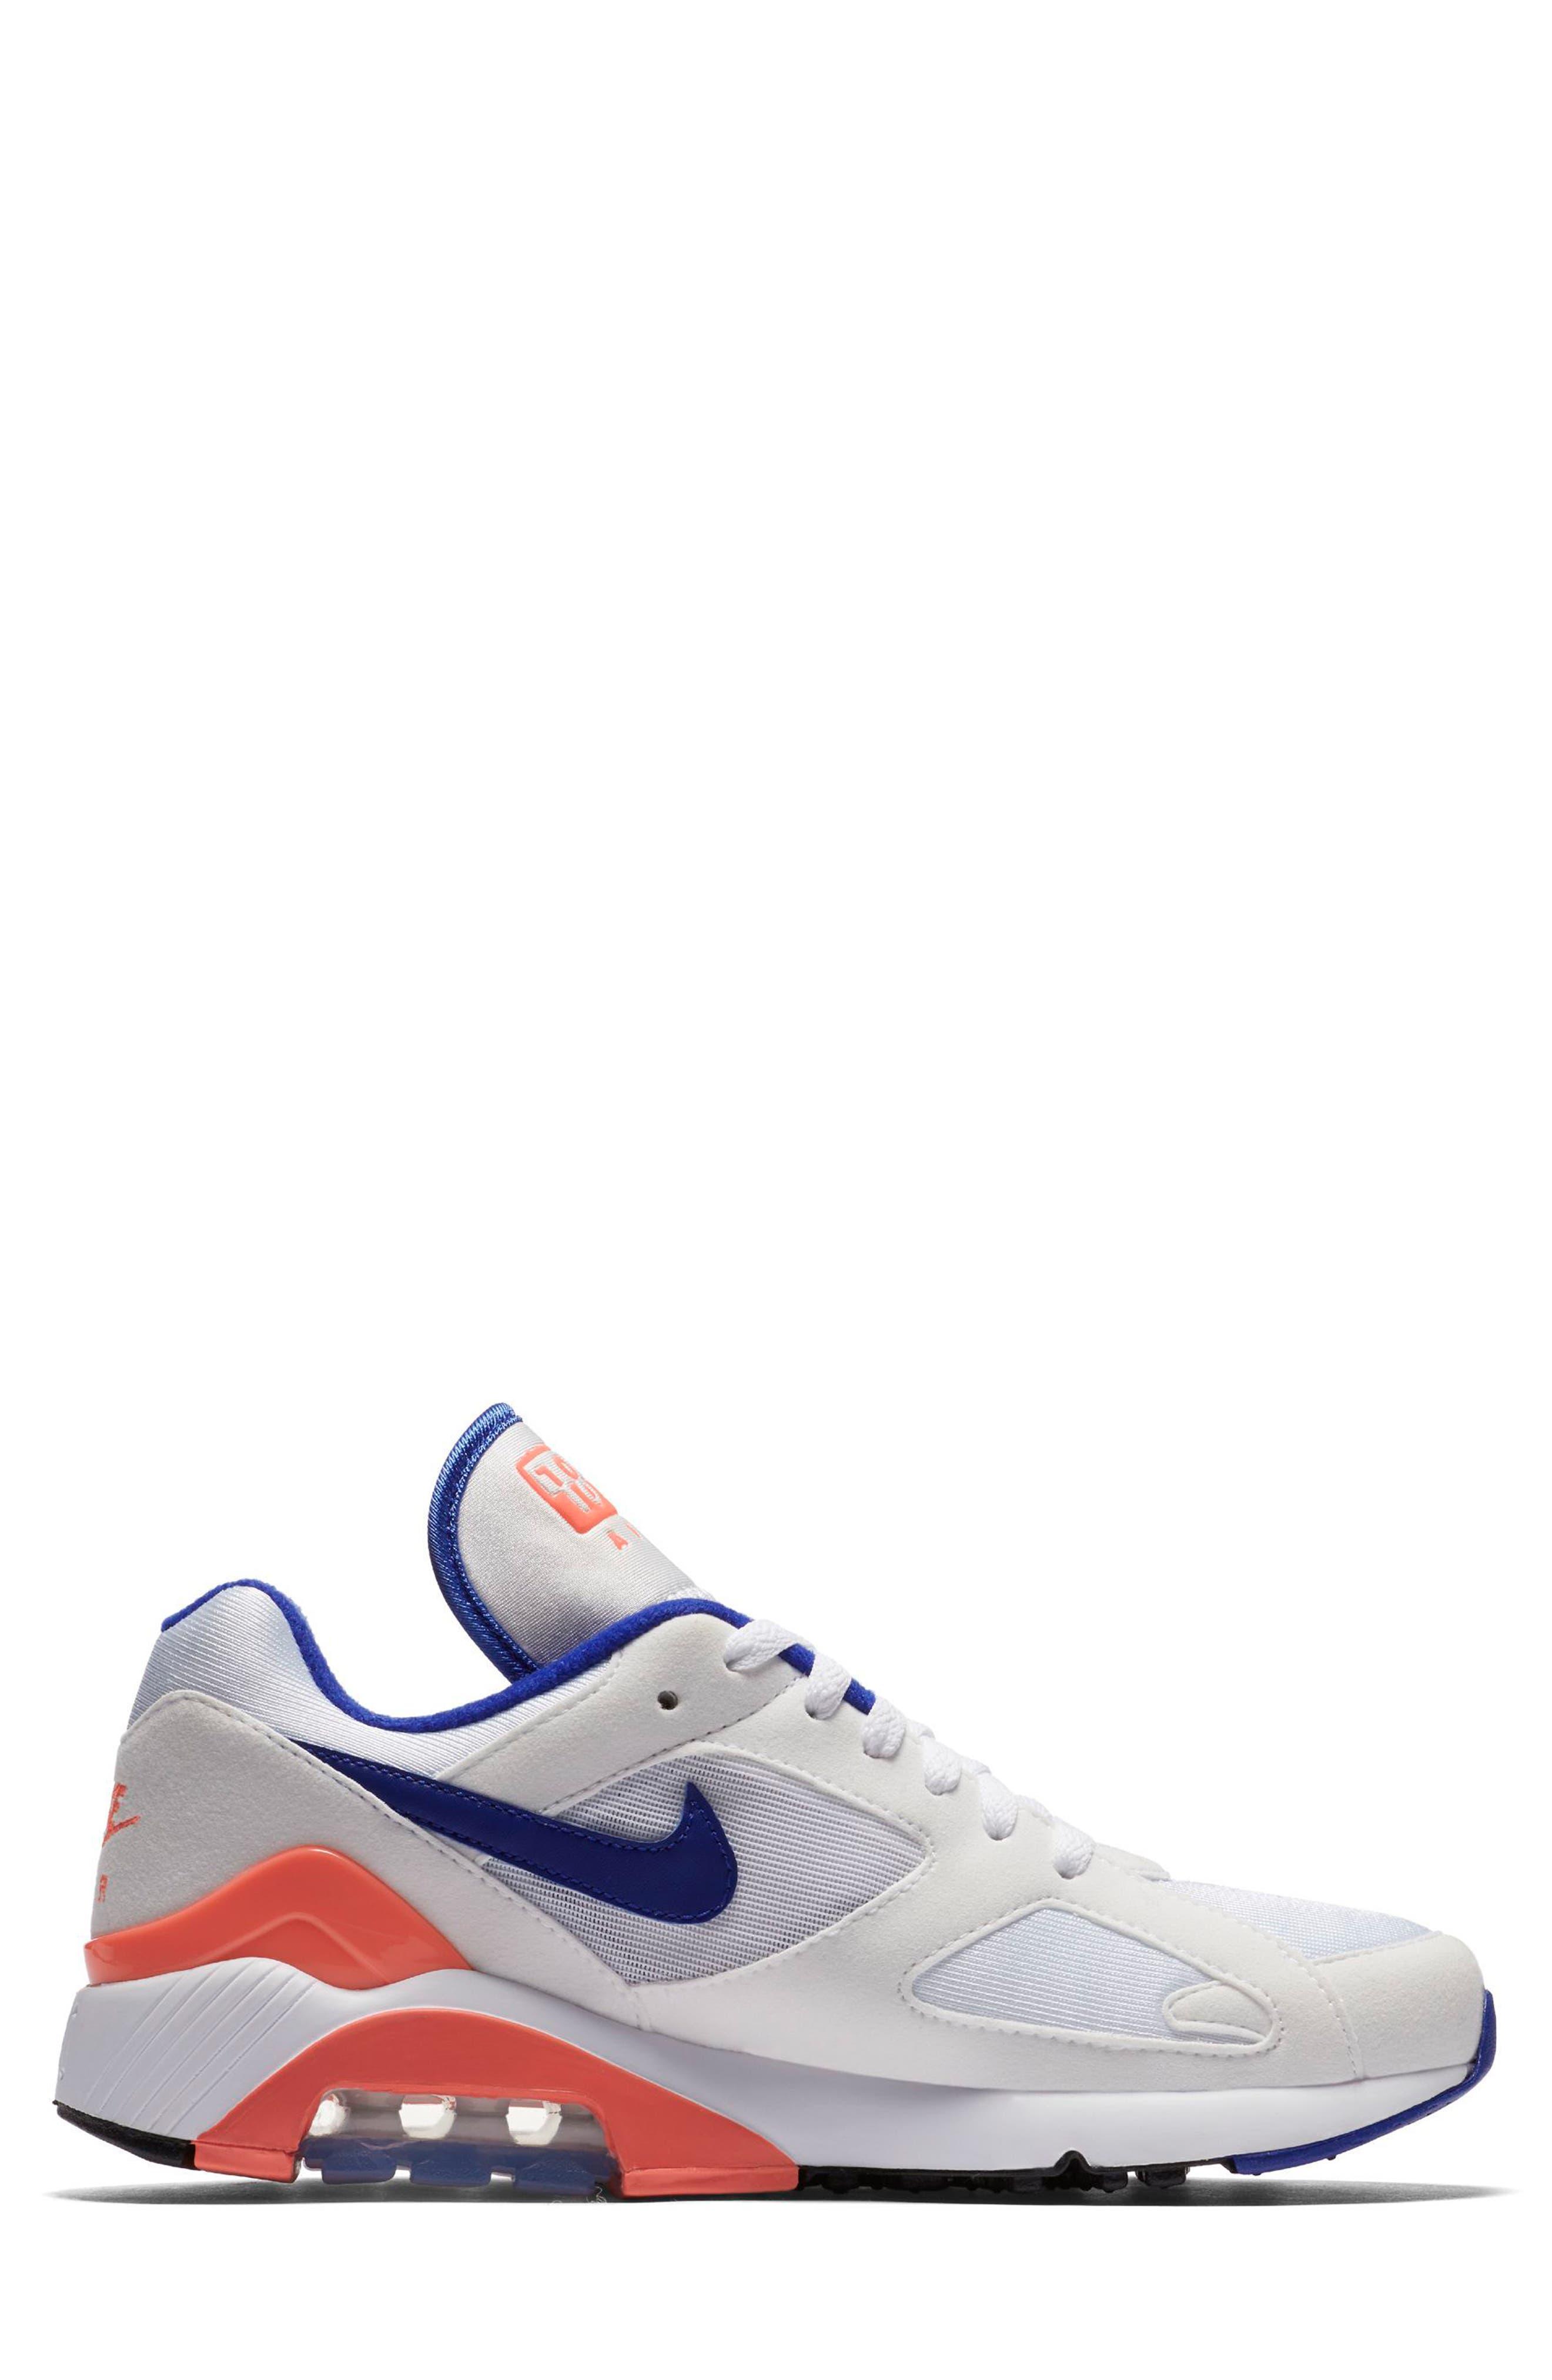 Air Max 180 Sneaker,                             Alternate thumbnail 3, color,                             White/ Ultramarine